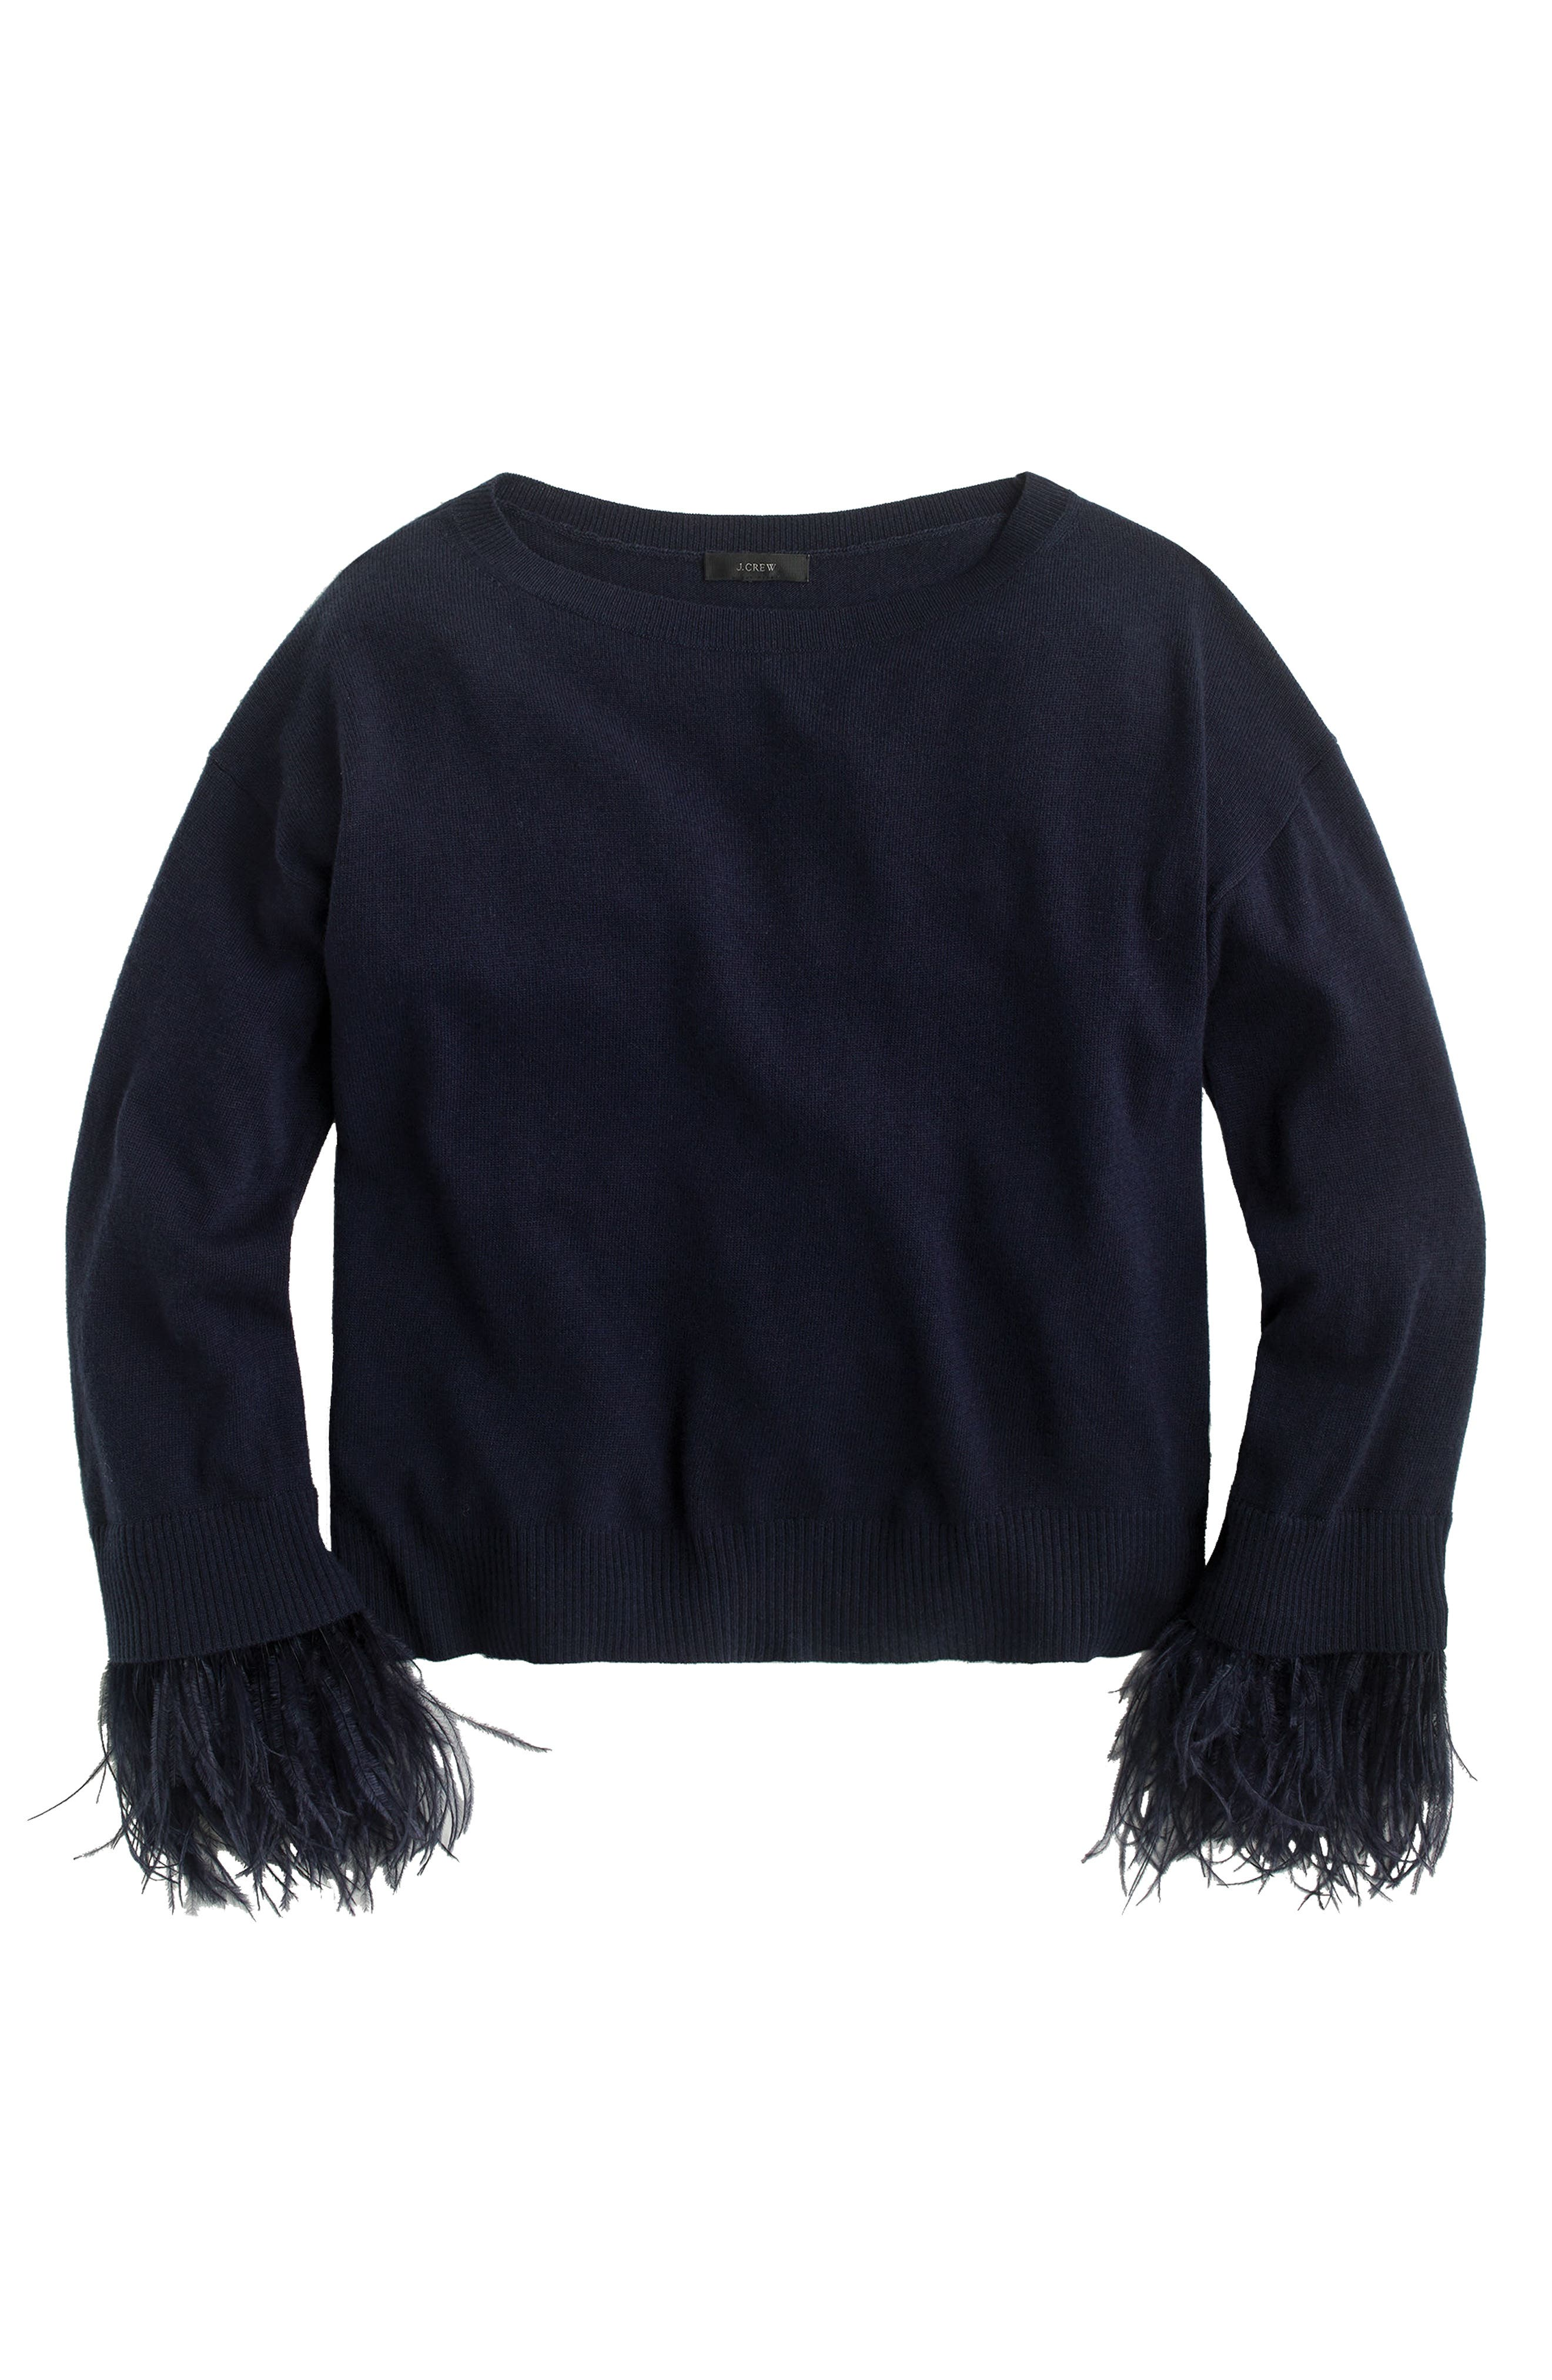 J.Crew Feather Sleeve Crewneck Sweater